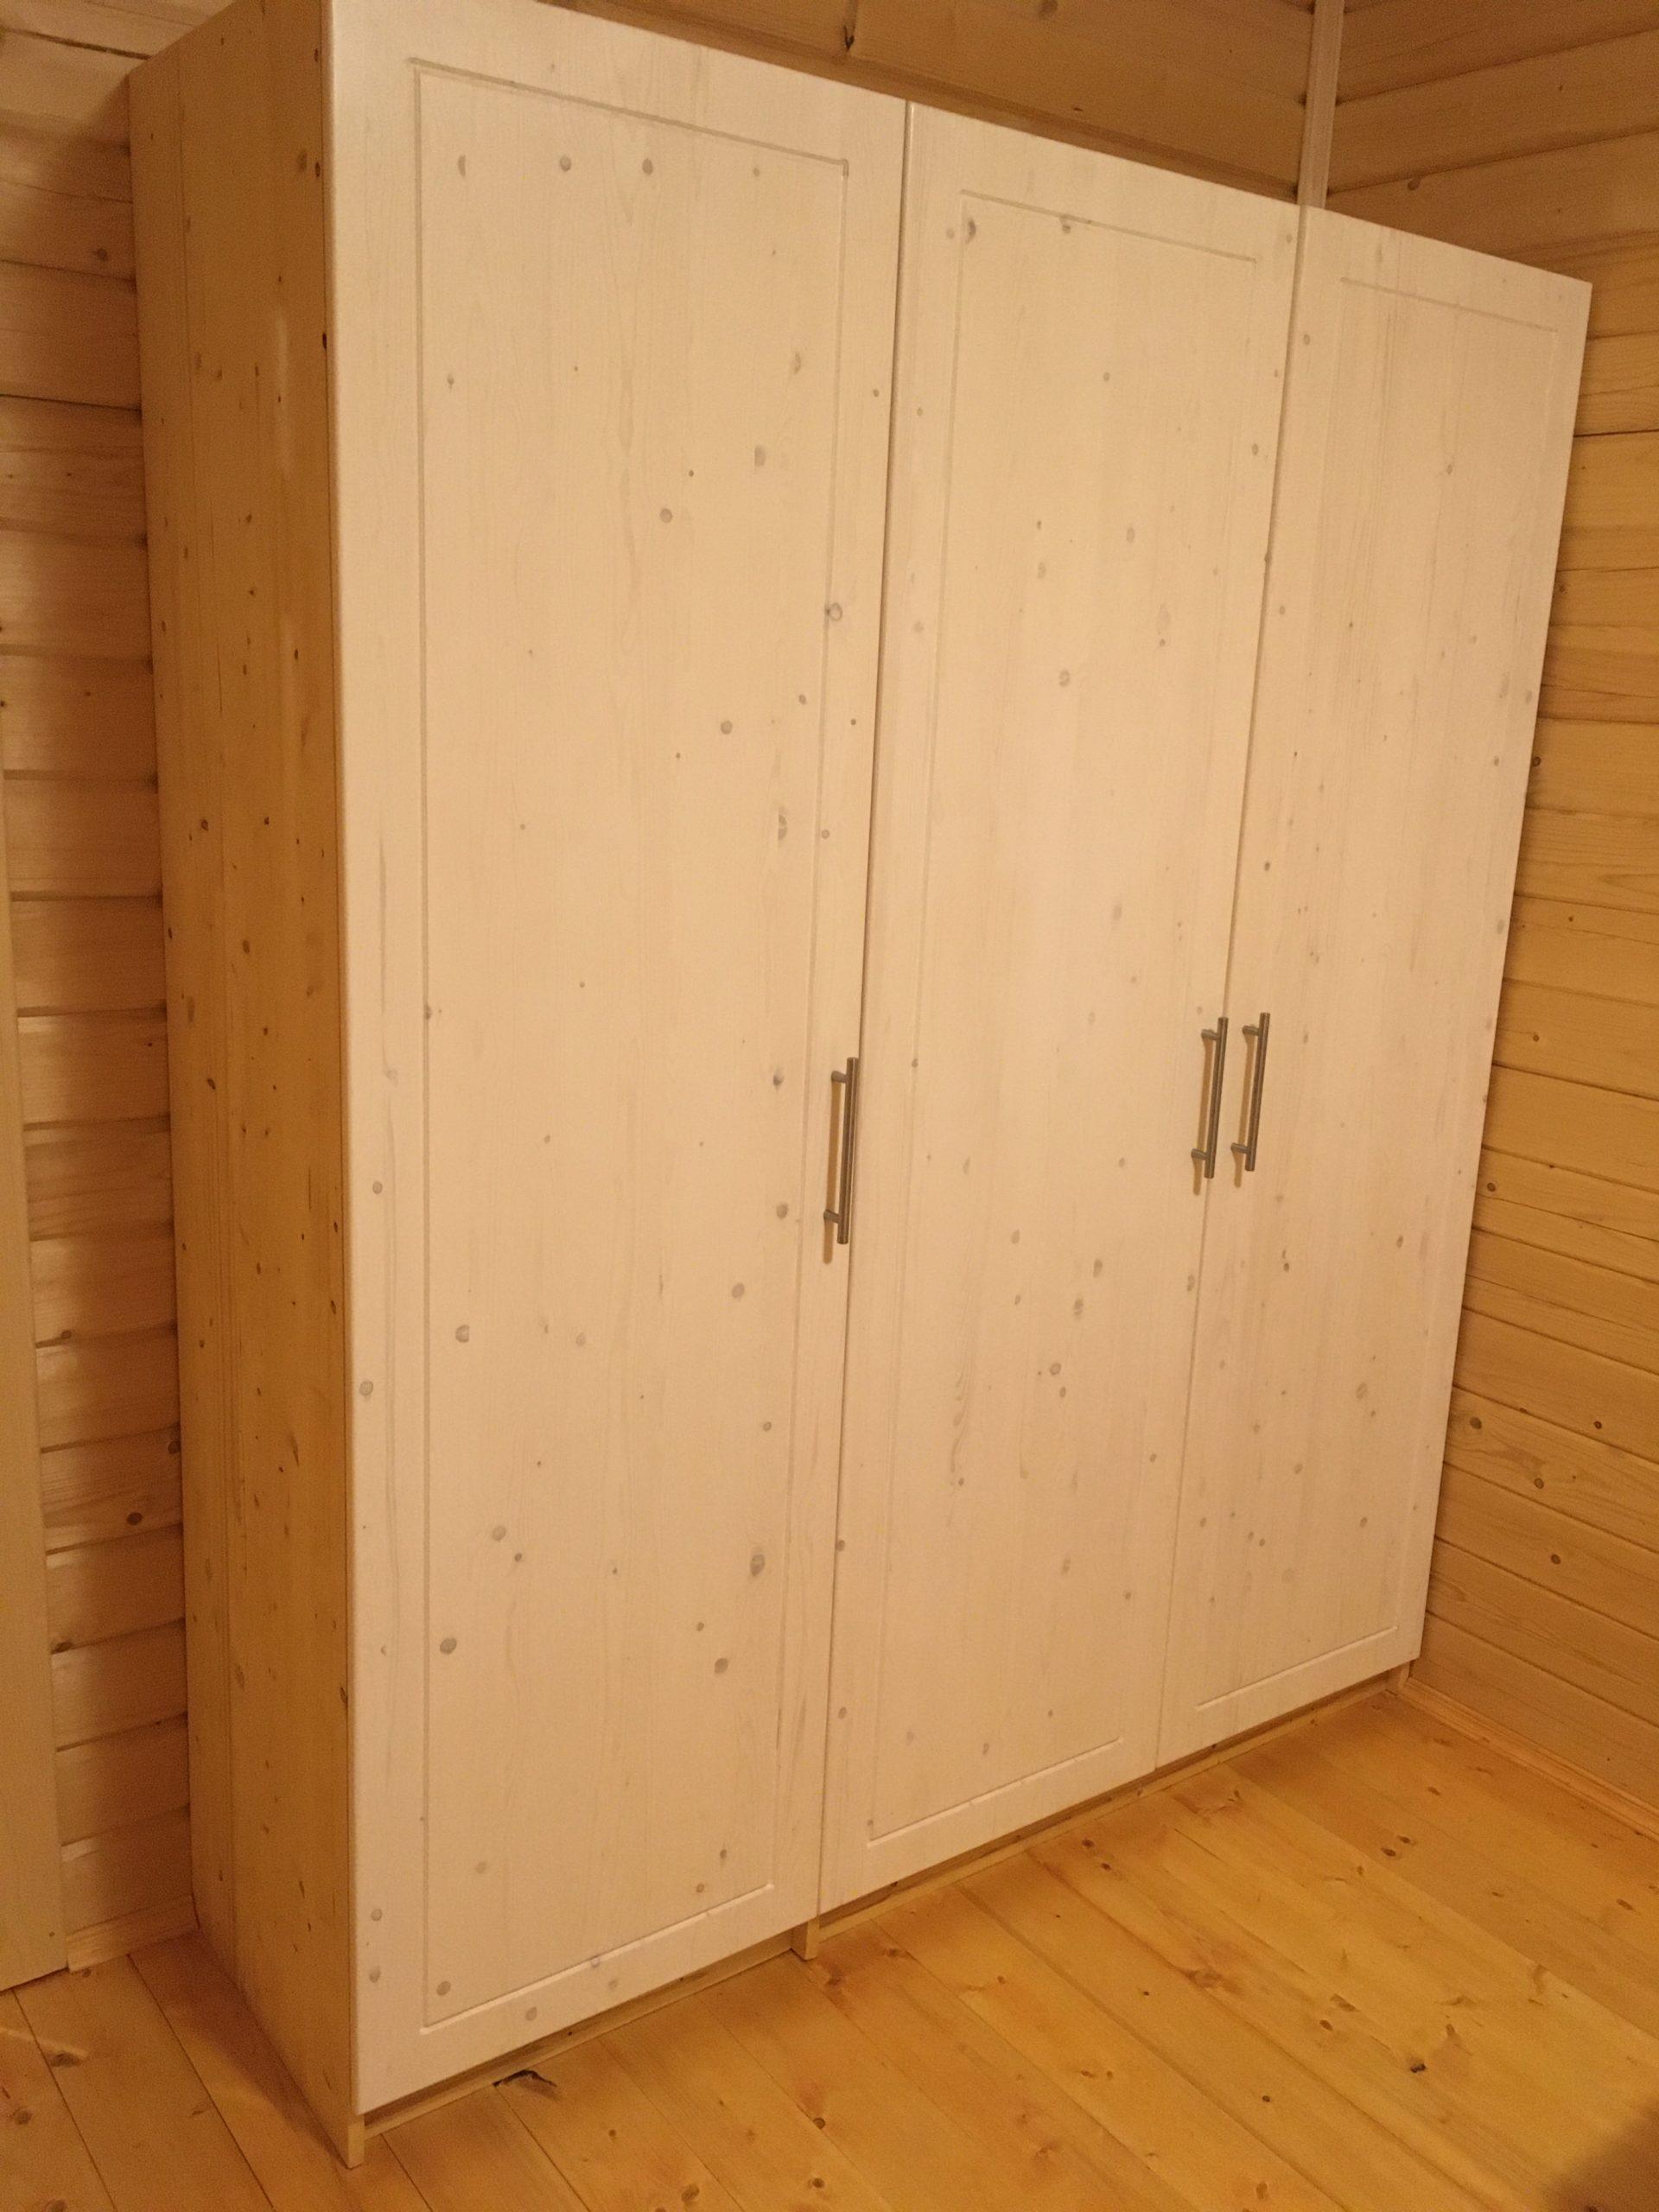 Трехстворчатый деревянный шкаф